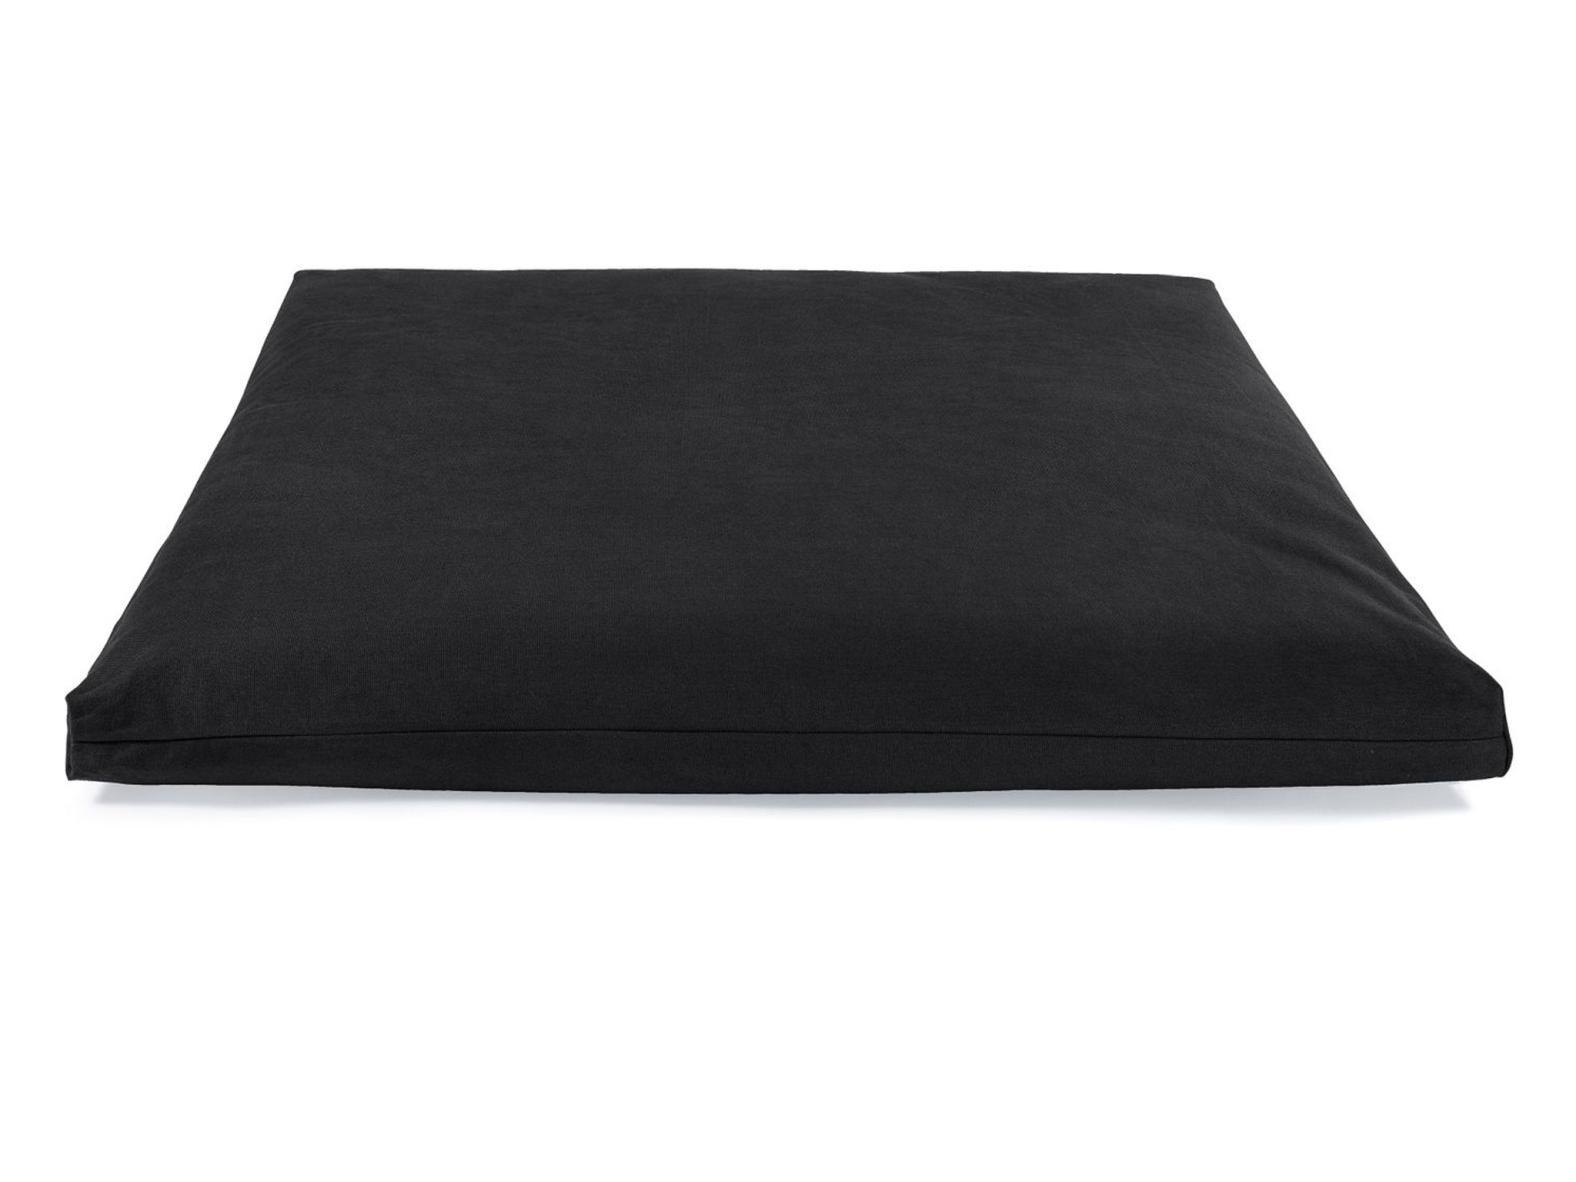 Meditationsmatte Zabuton PREMIUM - Schwarz - 100% BIO Baumwolle - 85 x 80 cm